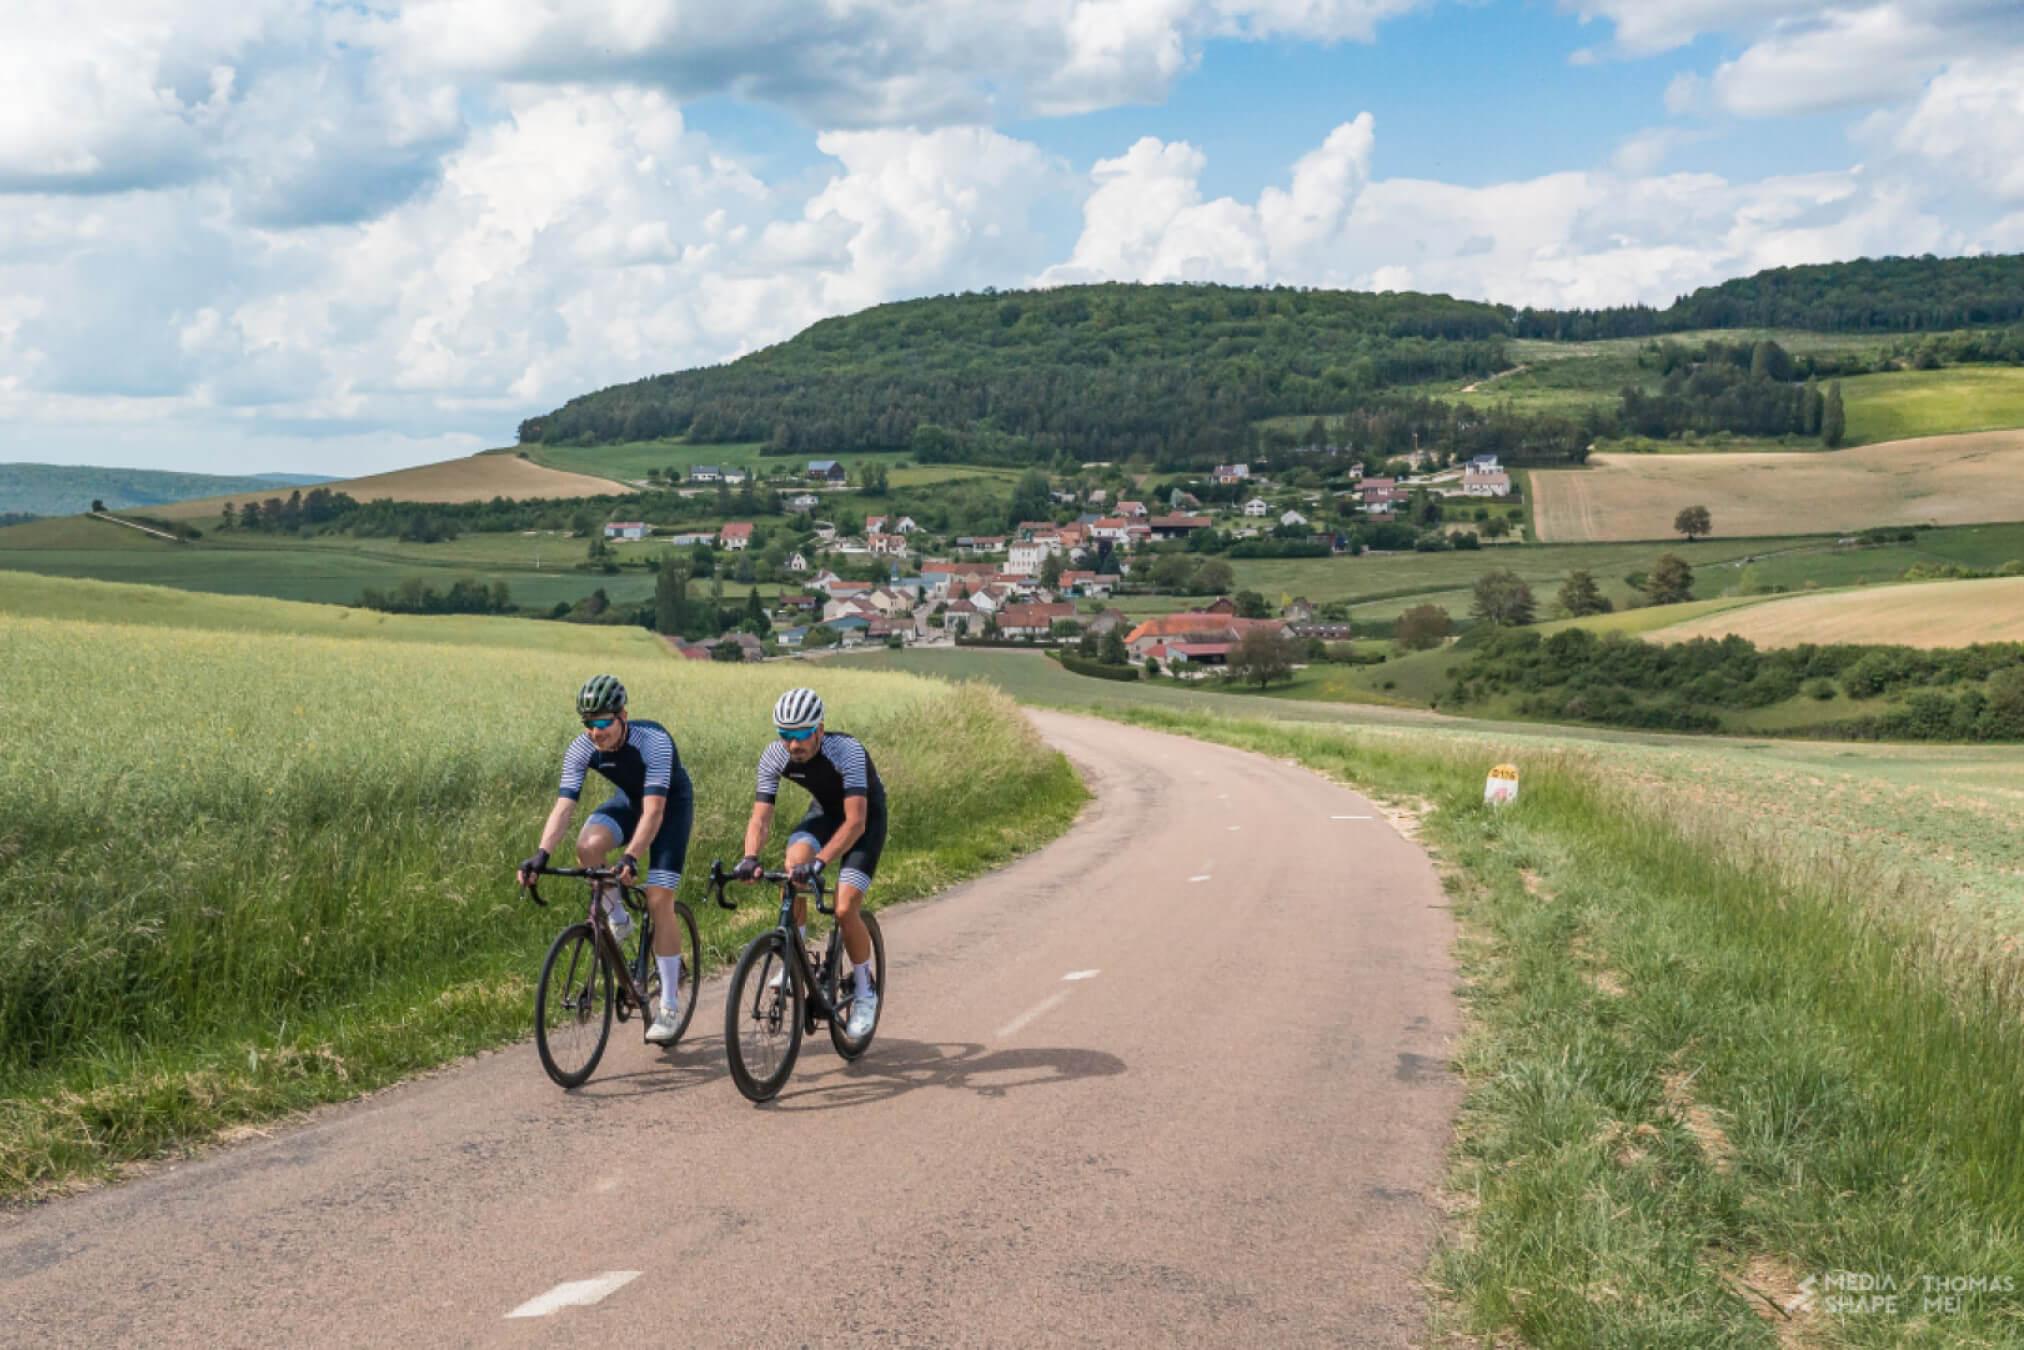 cyclistes en velo dans paysage Normand